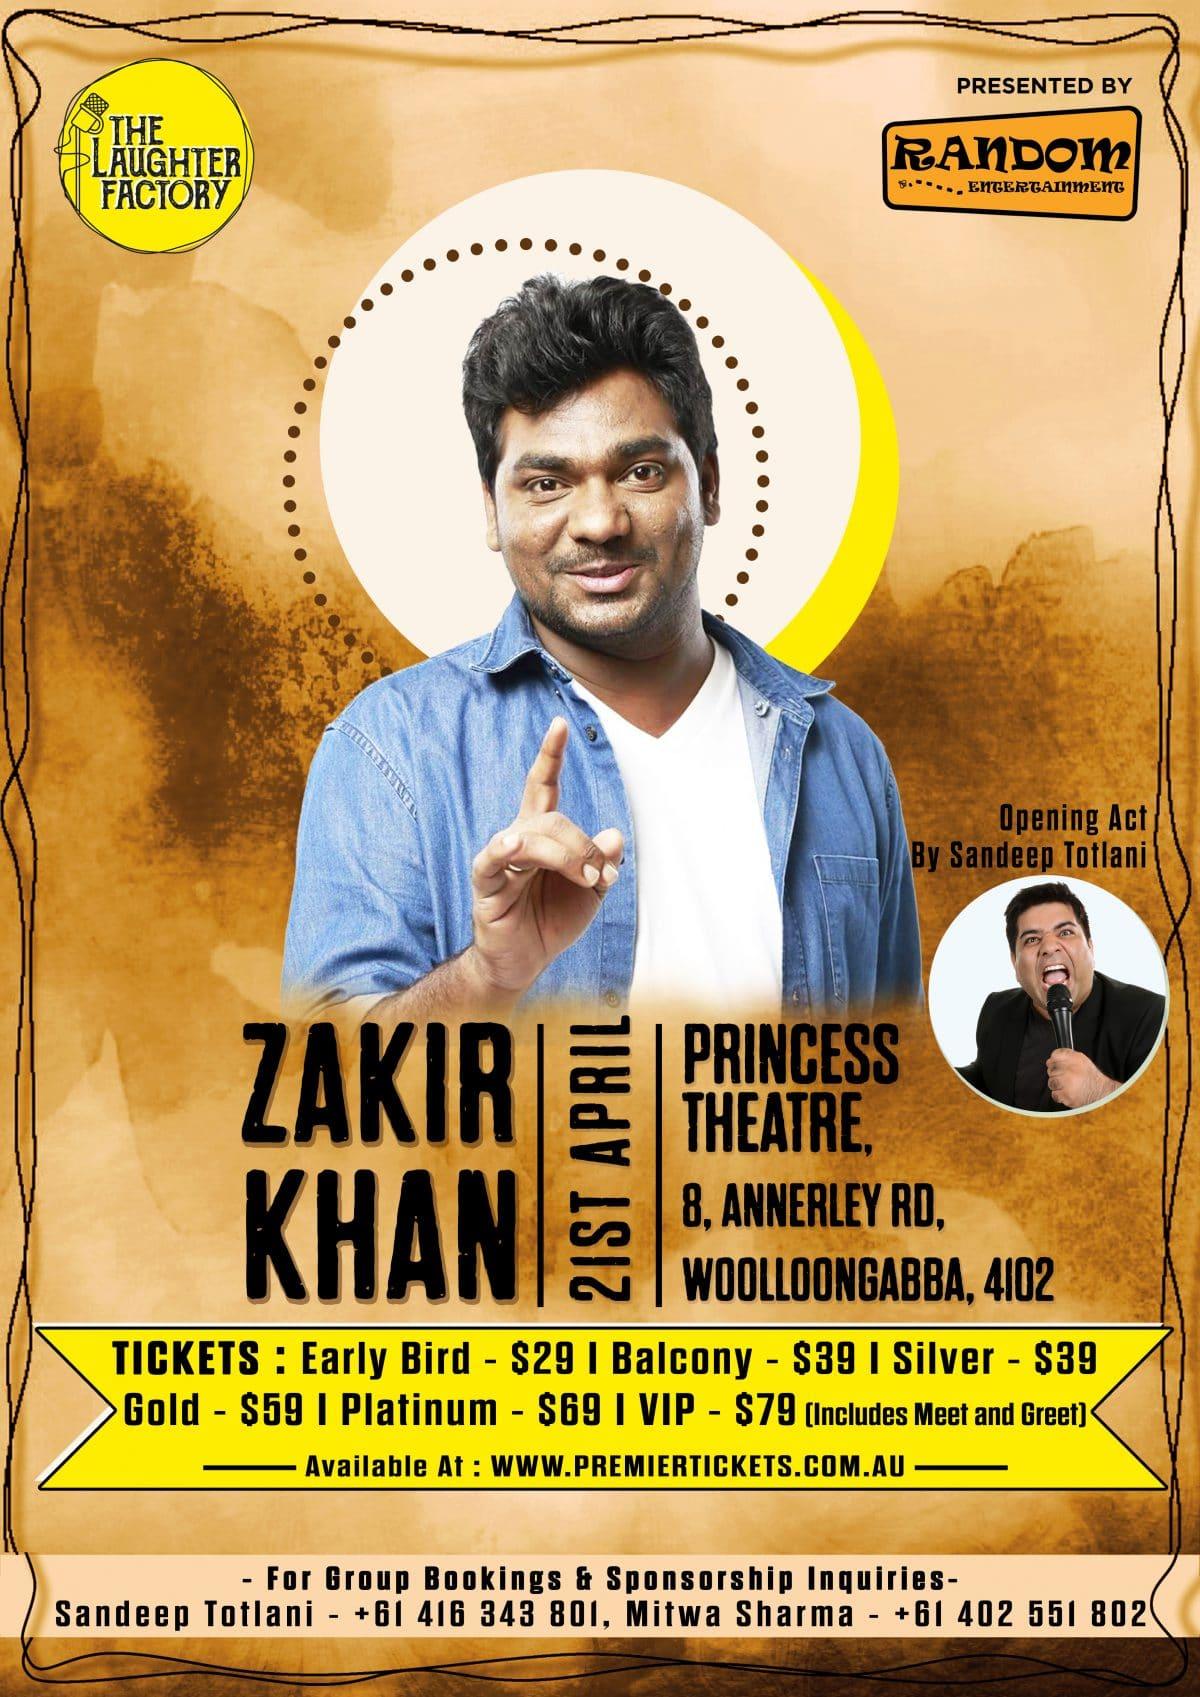 https://www.premiertickets.com.au/event/zakir-khan-stand-up-comedian-live-in-brisbane/